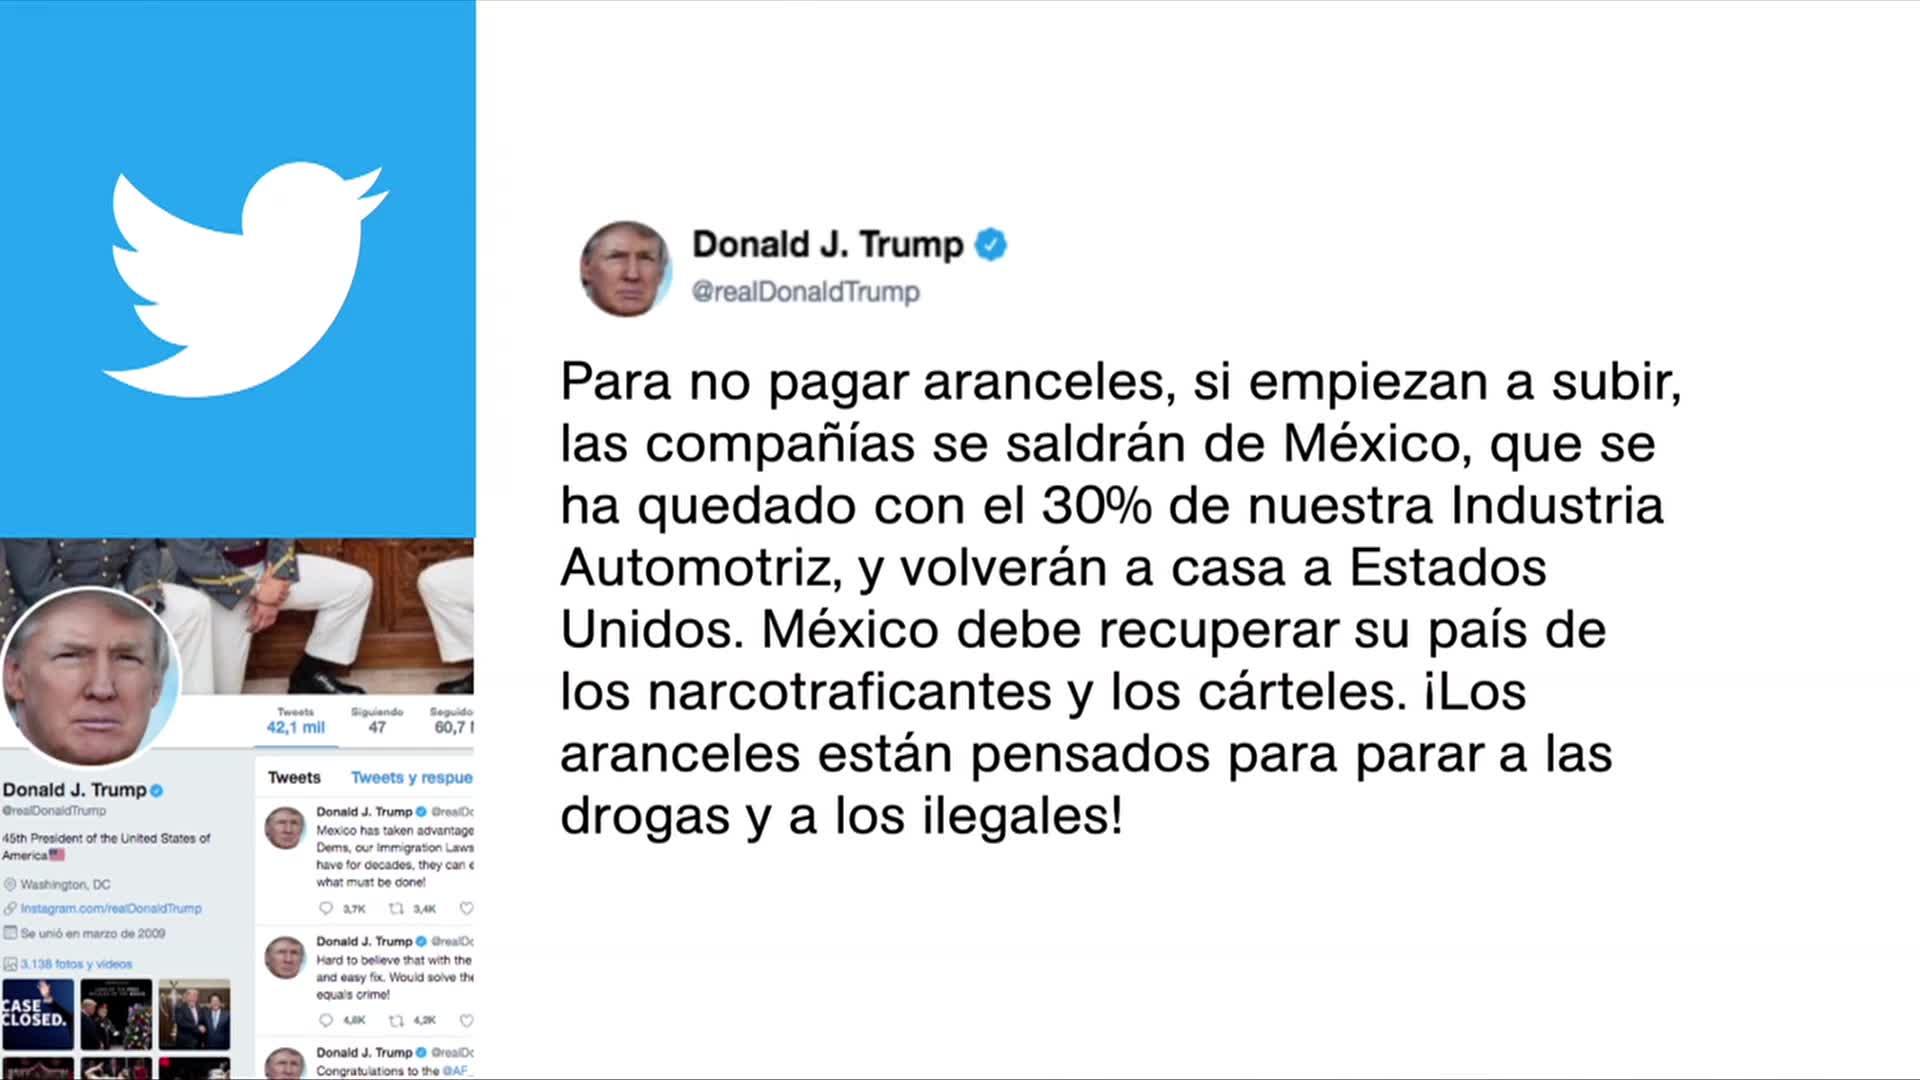 Aranceles son para parar drogas e ilegales, dice Trump